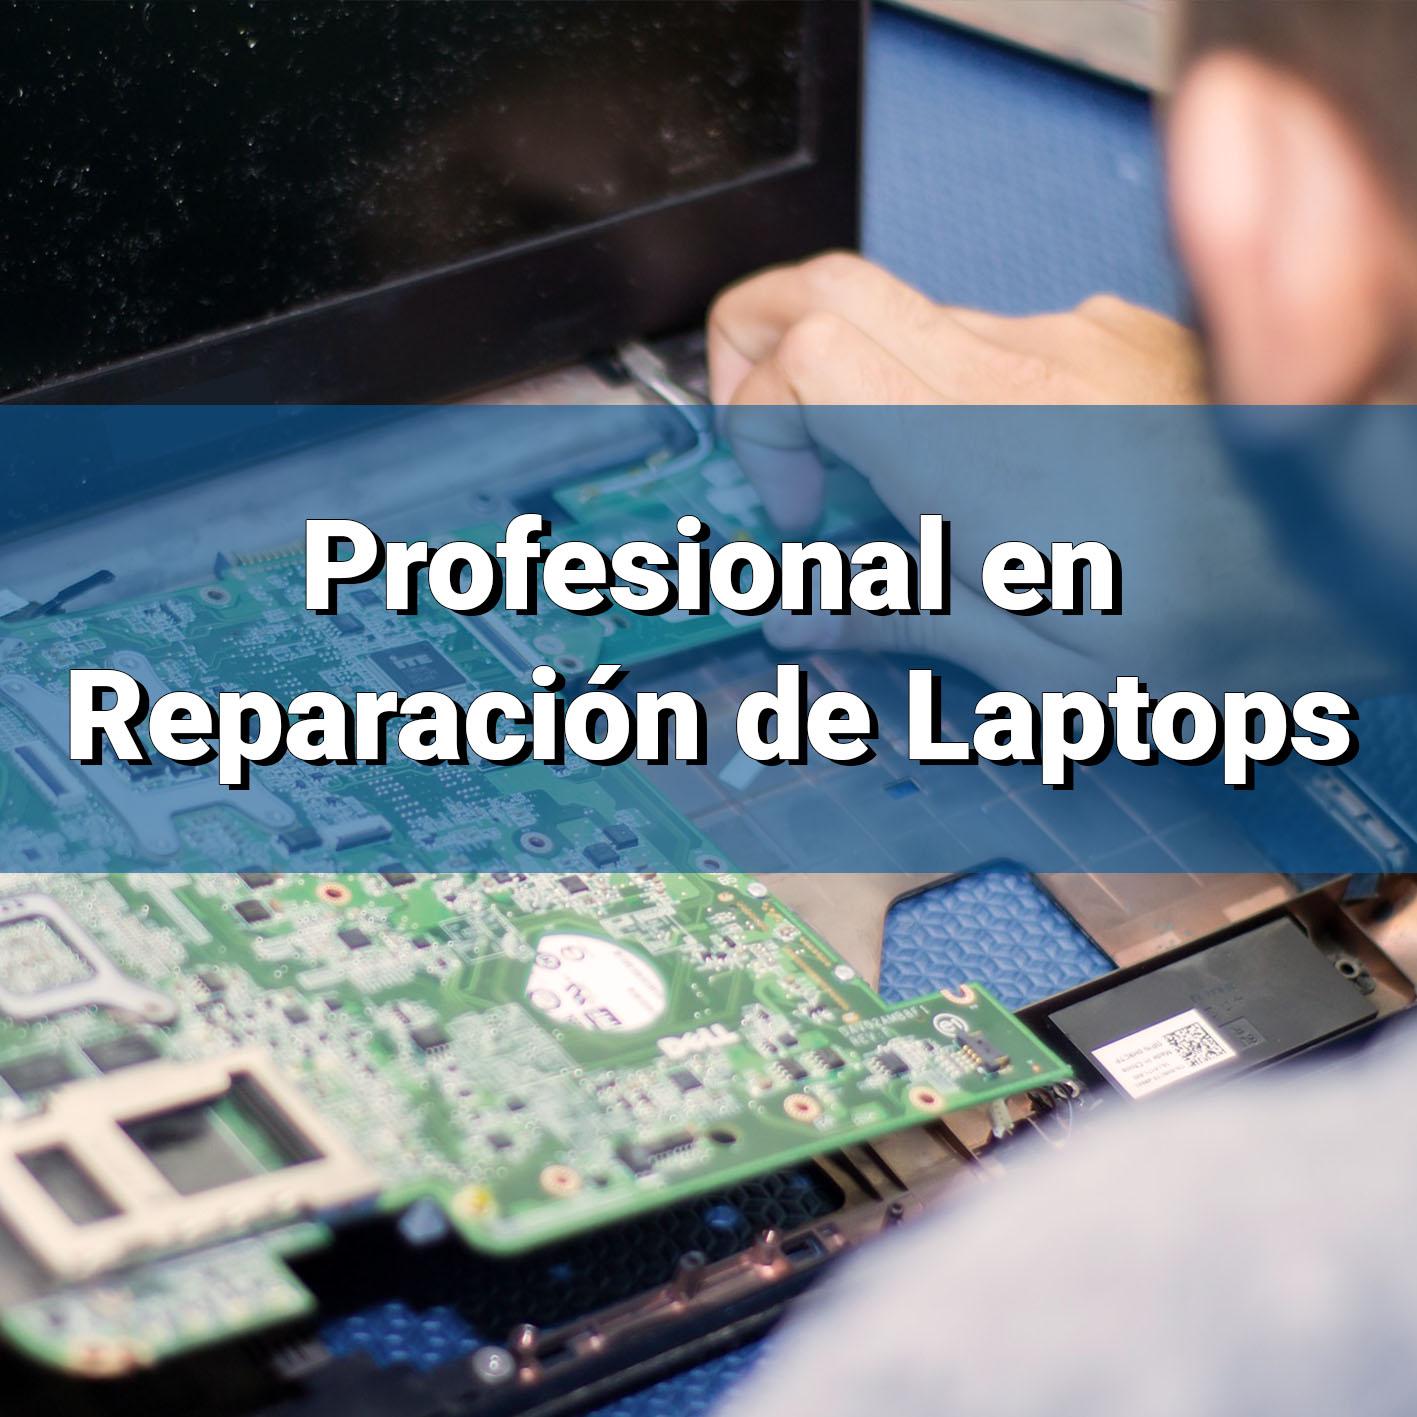 Profesional en Reparación de Laptops